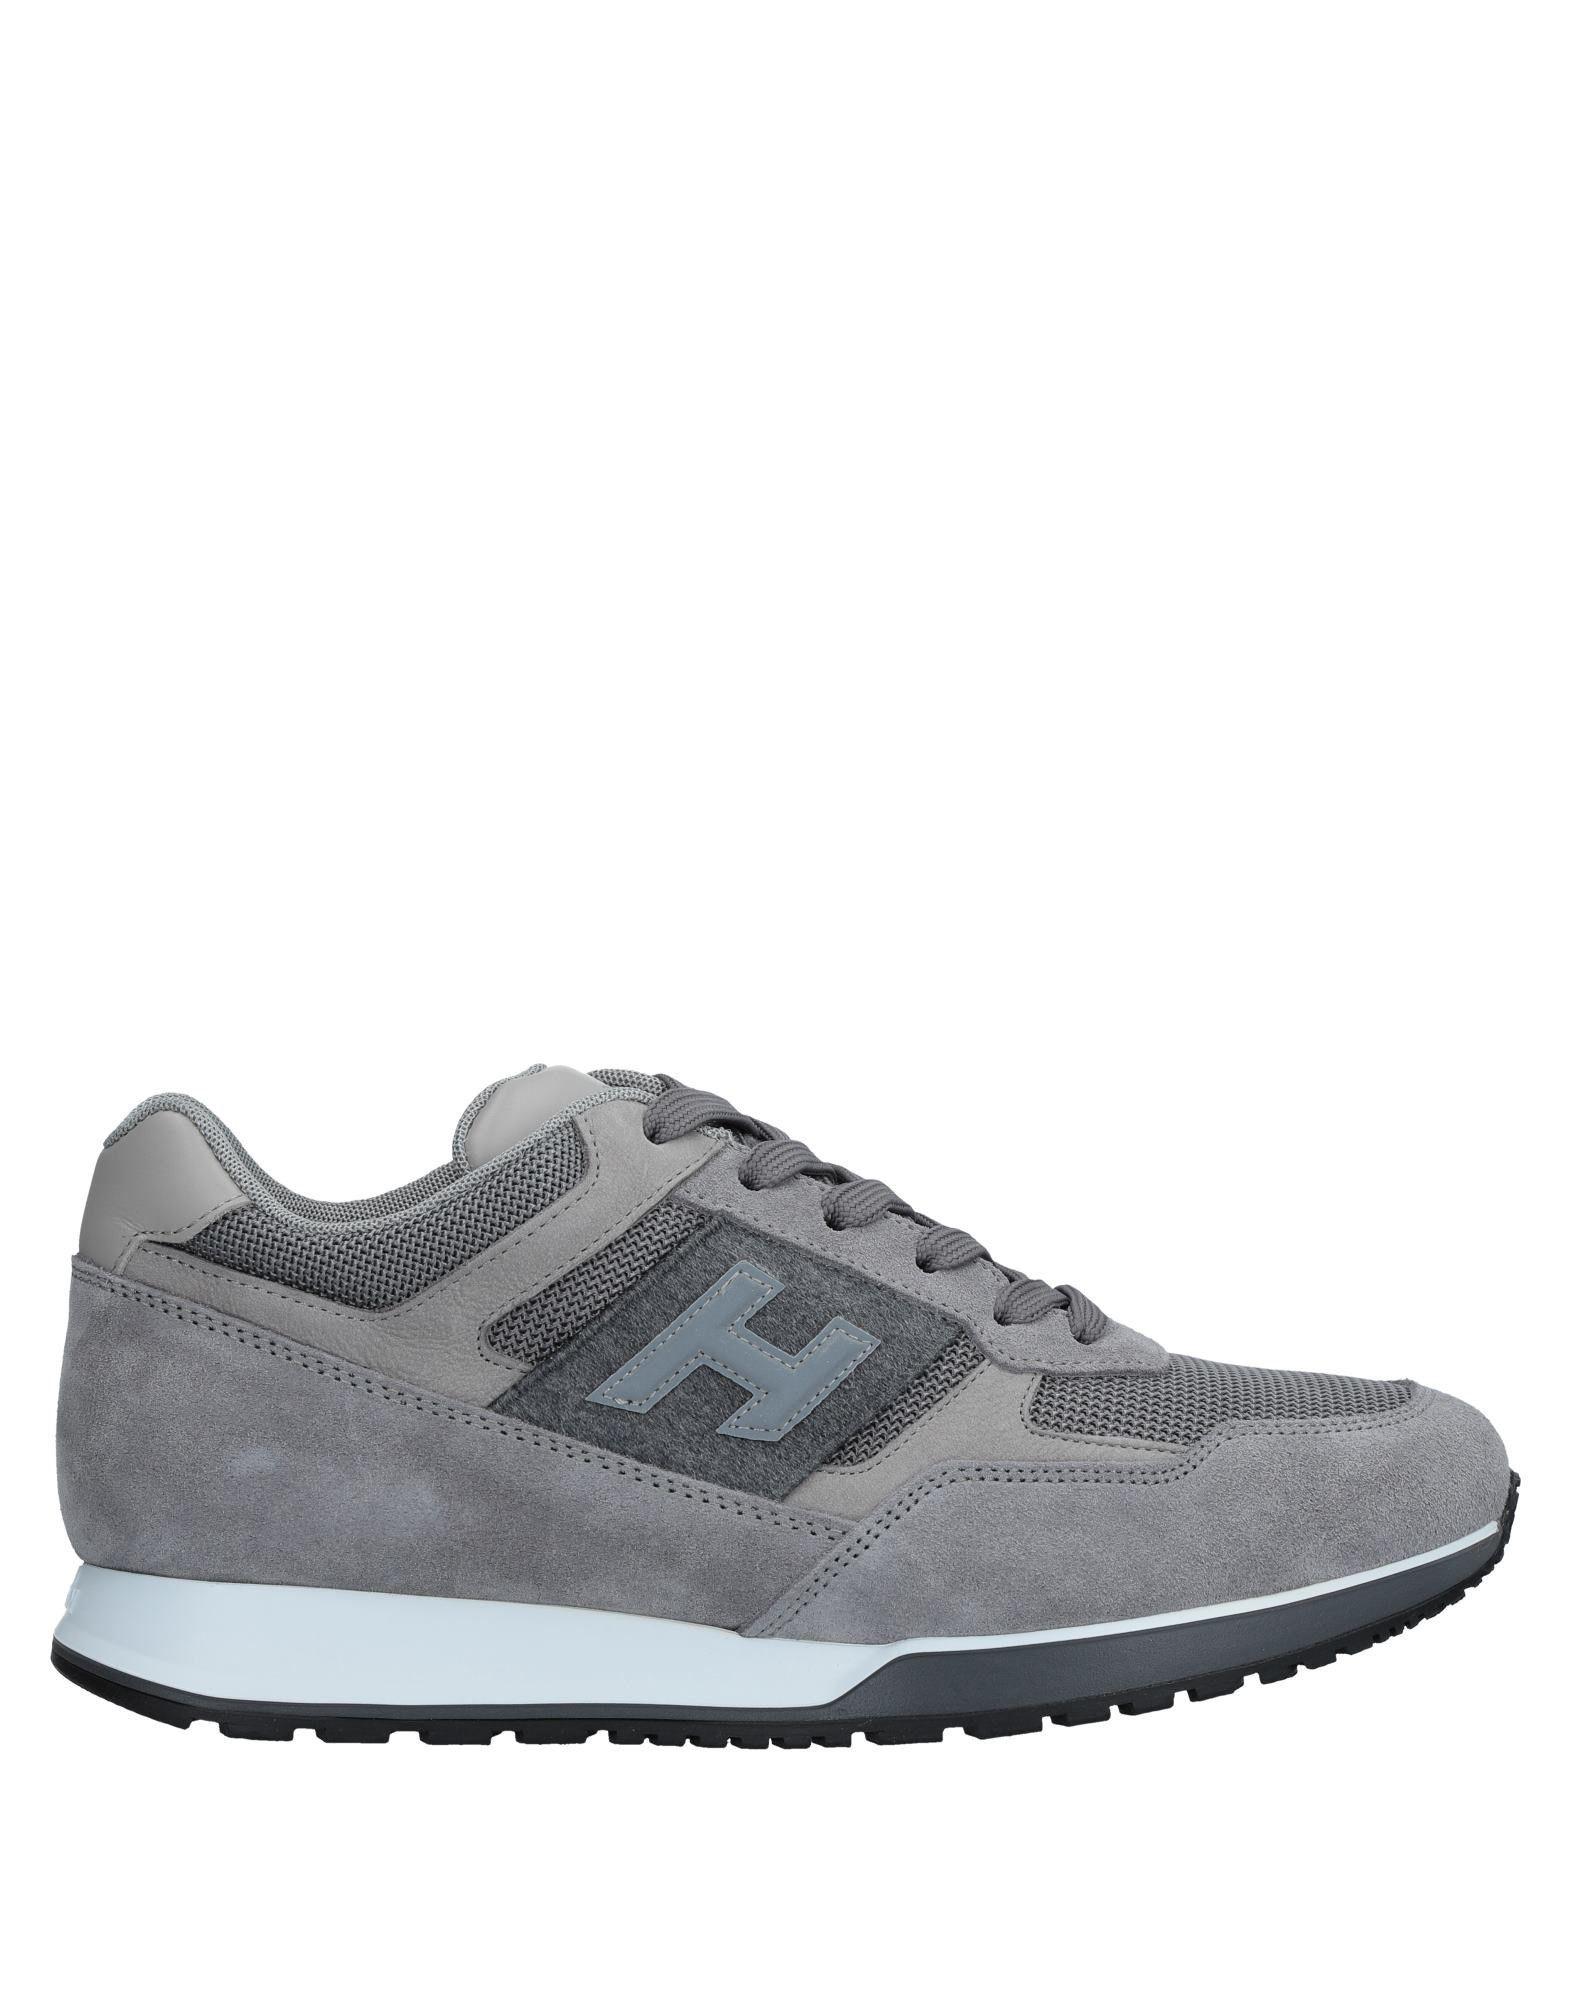 Hogan Sneakers Herren  11540987IT Gute Qualität beliebte Schuhe